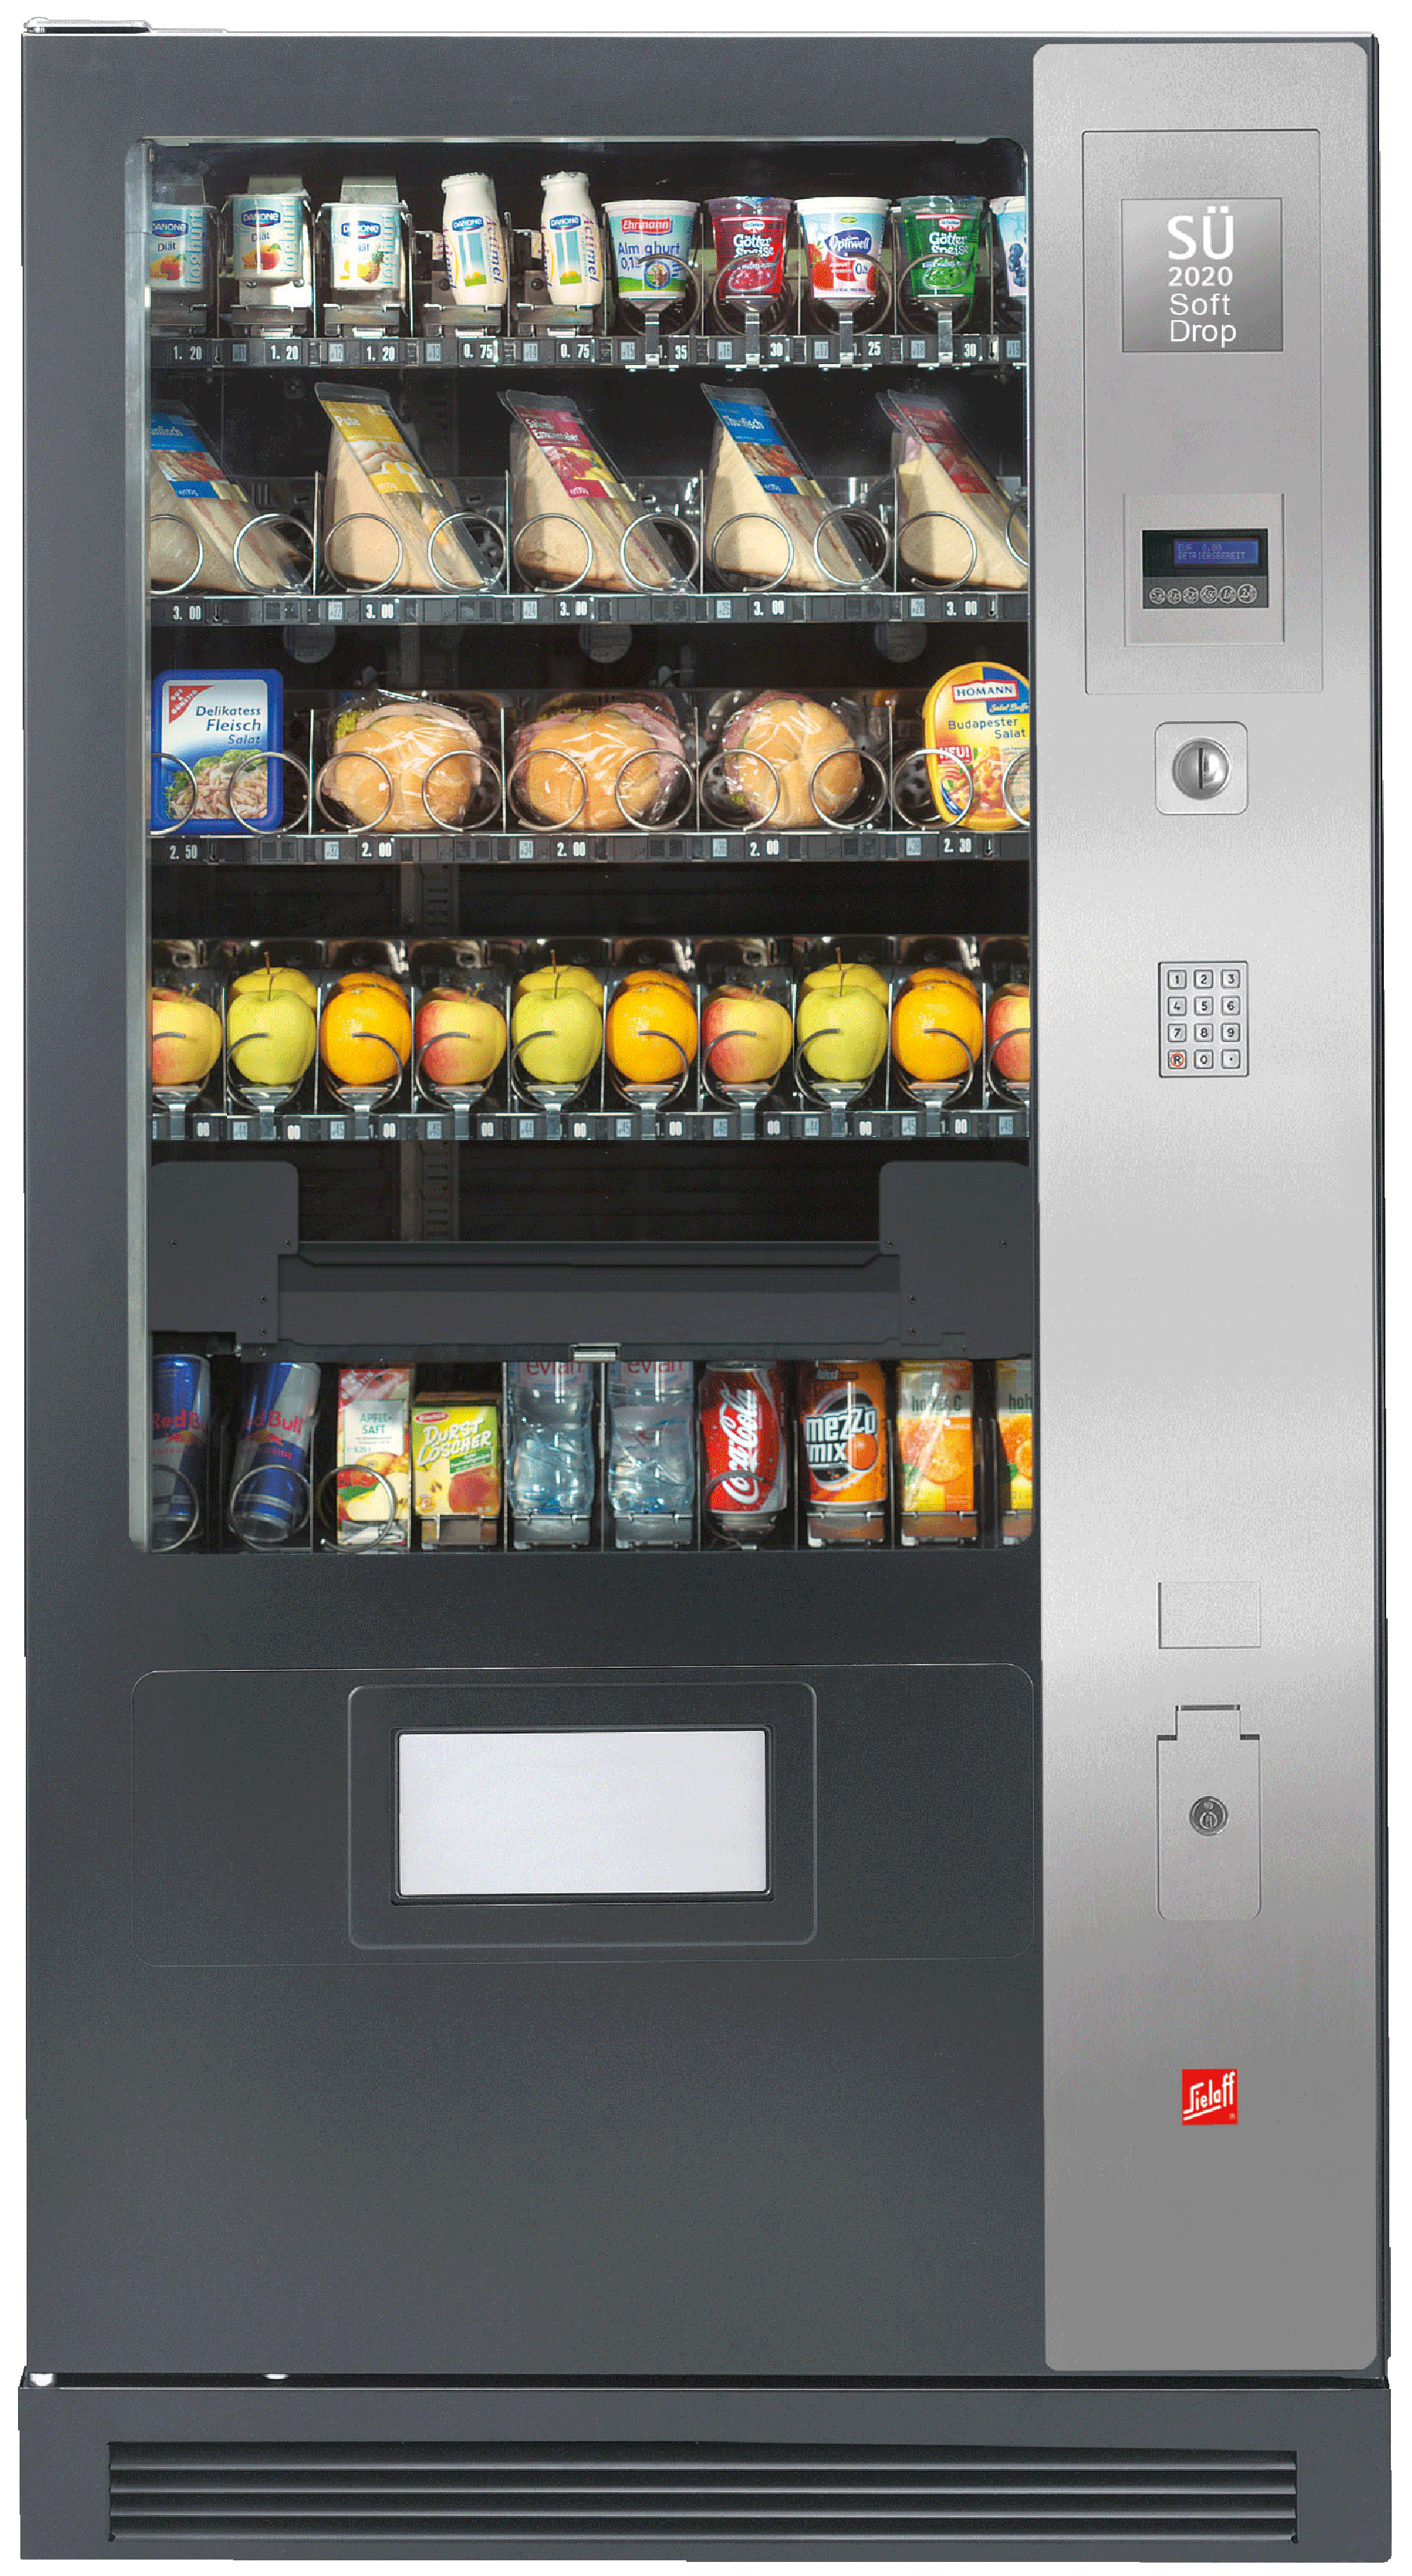 sielaff-s-2020-softdrop-by-flavura-verkaufsautomat-warenautomat-snackautomat-foodautomat